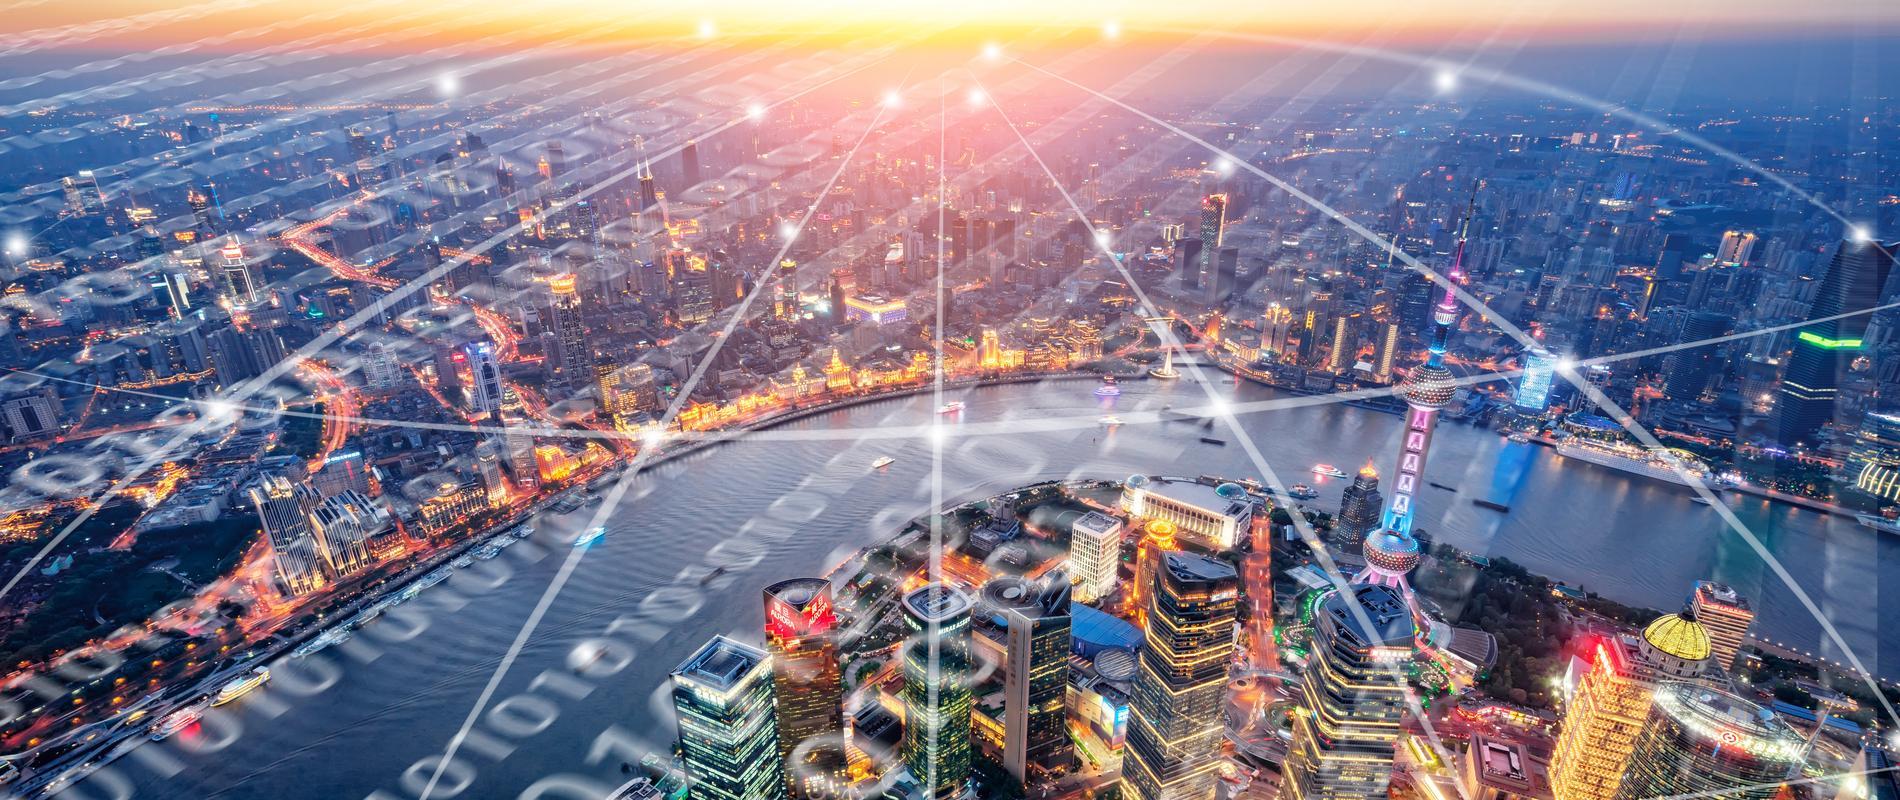 big data recurso ciudades digitales background fintech tech tecnologia